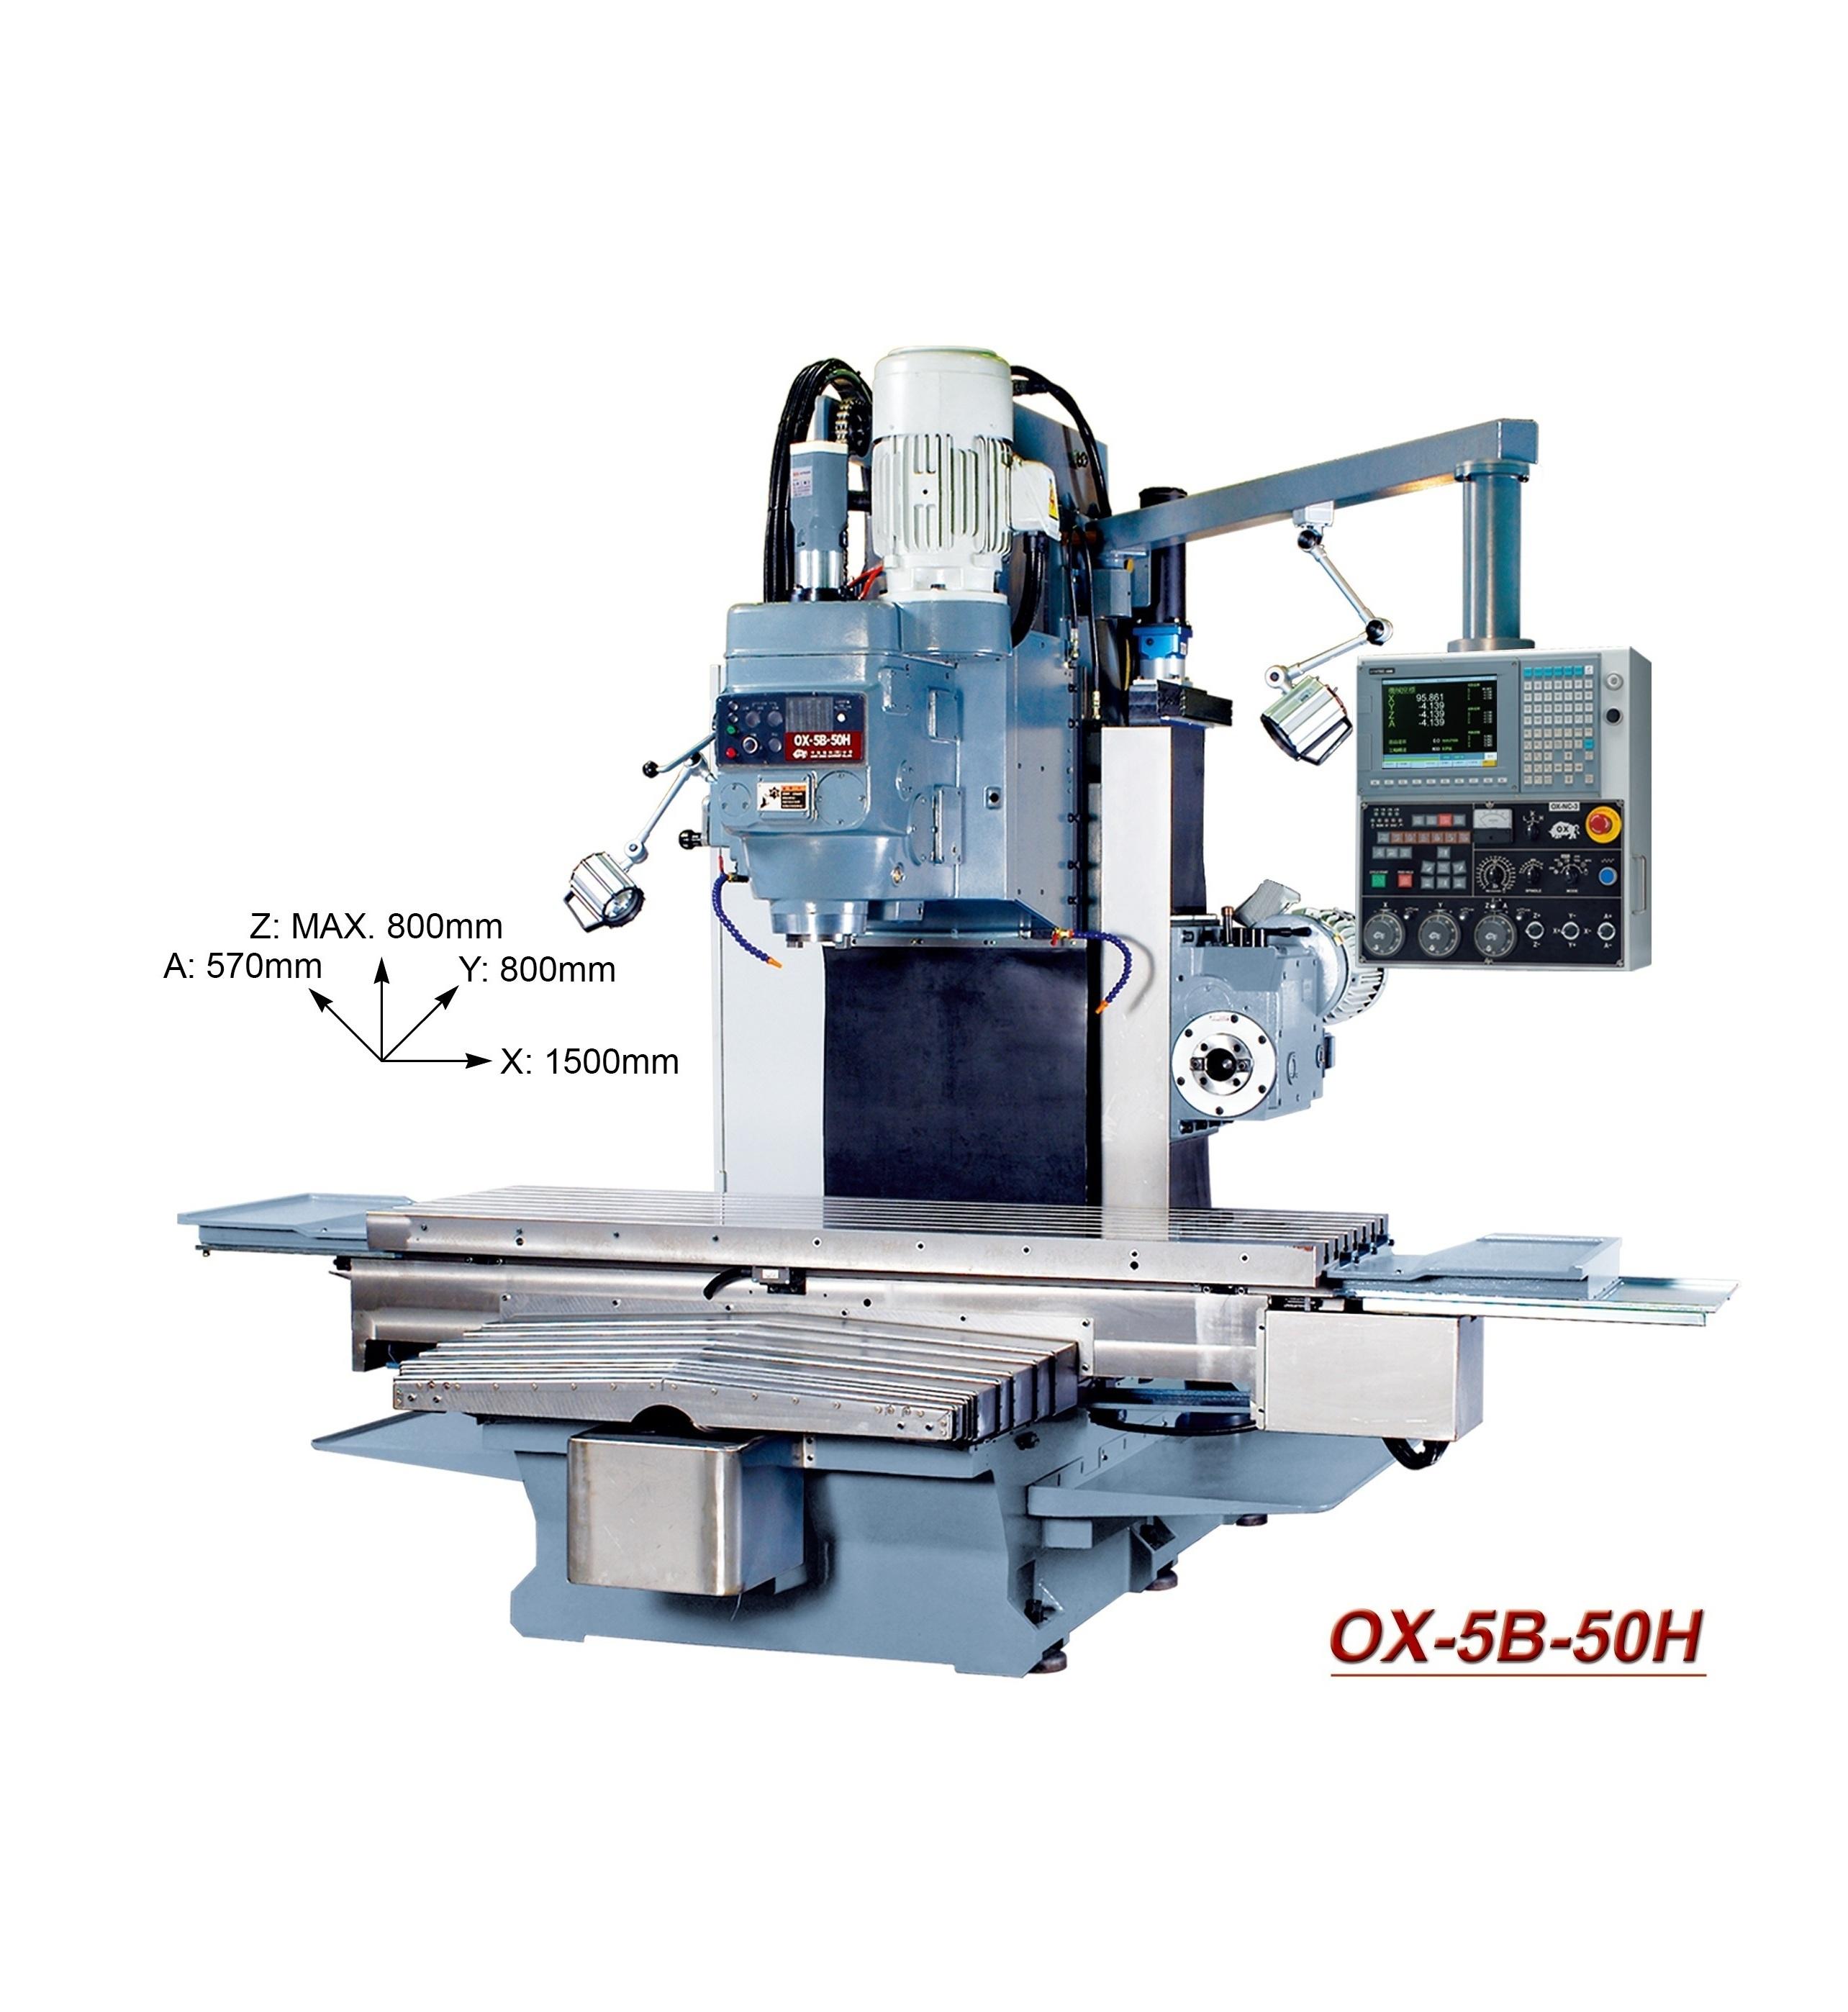 OX-CNC milling machine  OX-5B-50H